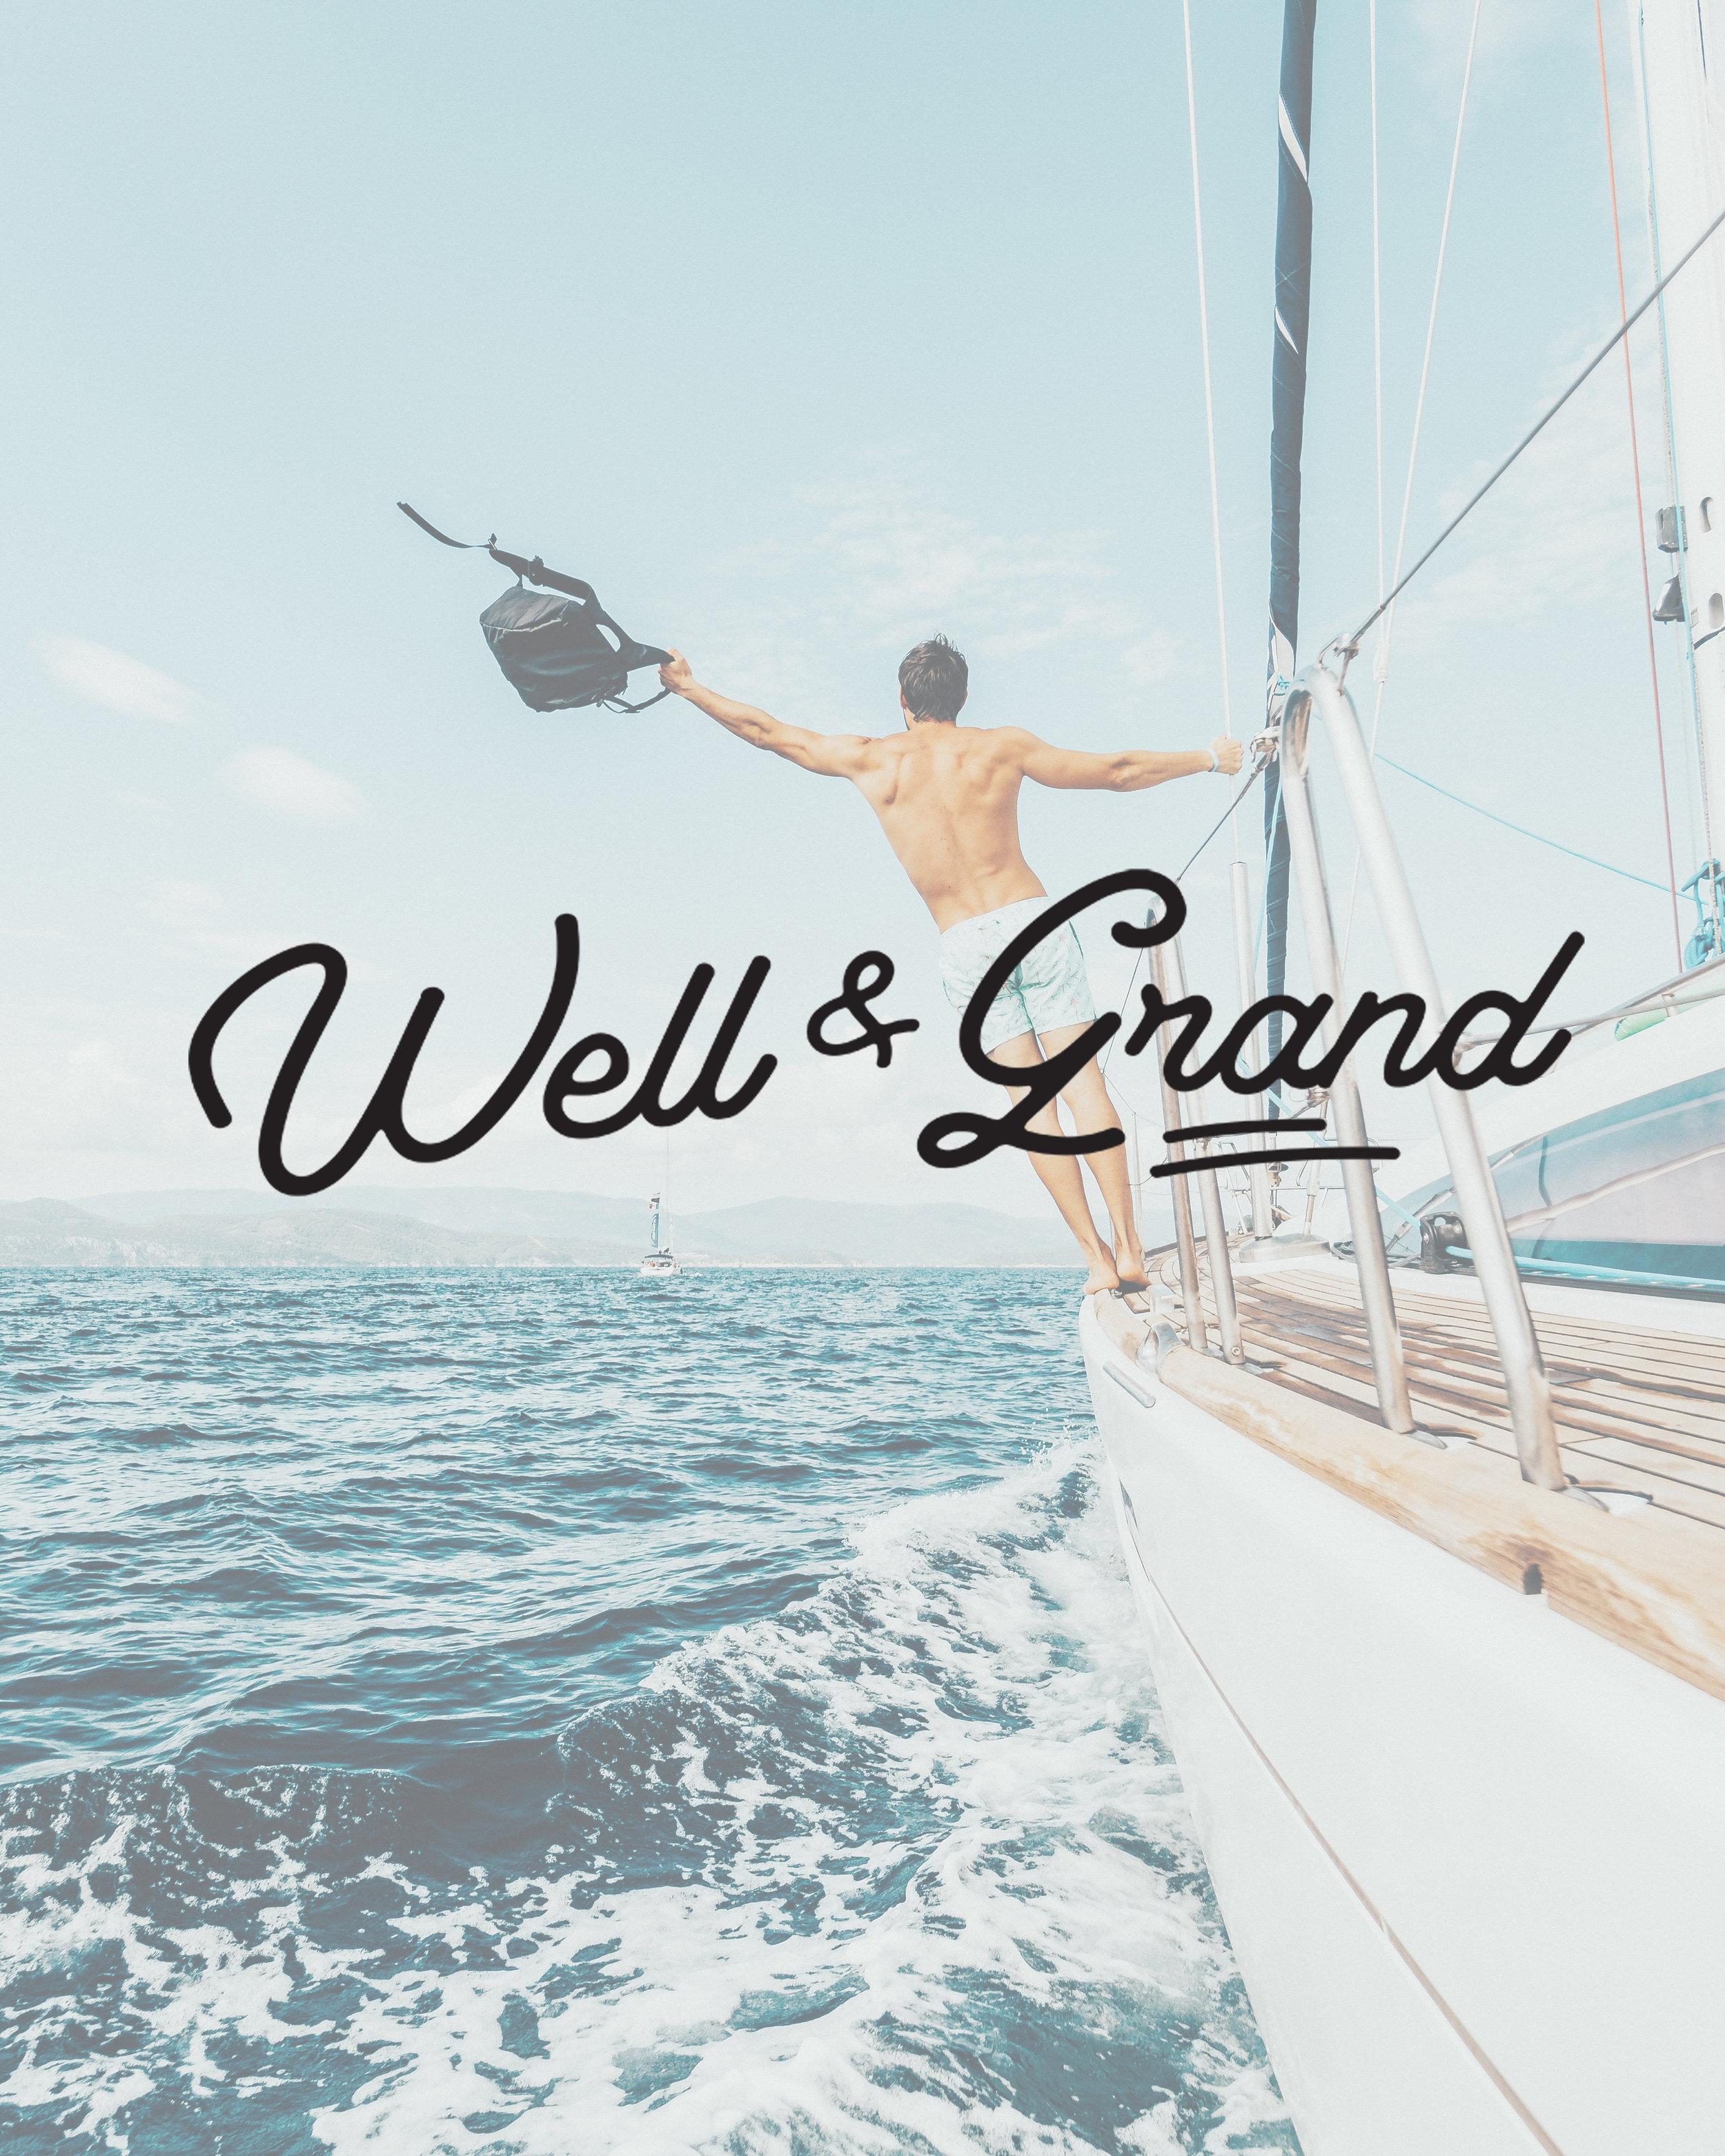 adventure-boat-freedom-1223649.jpg